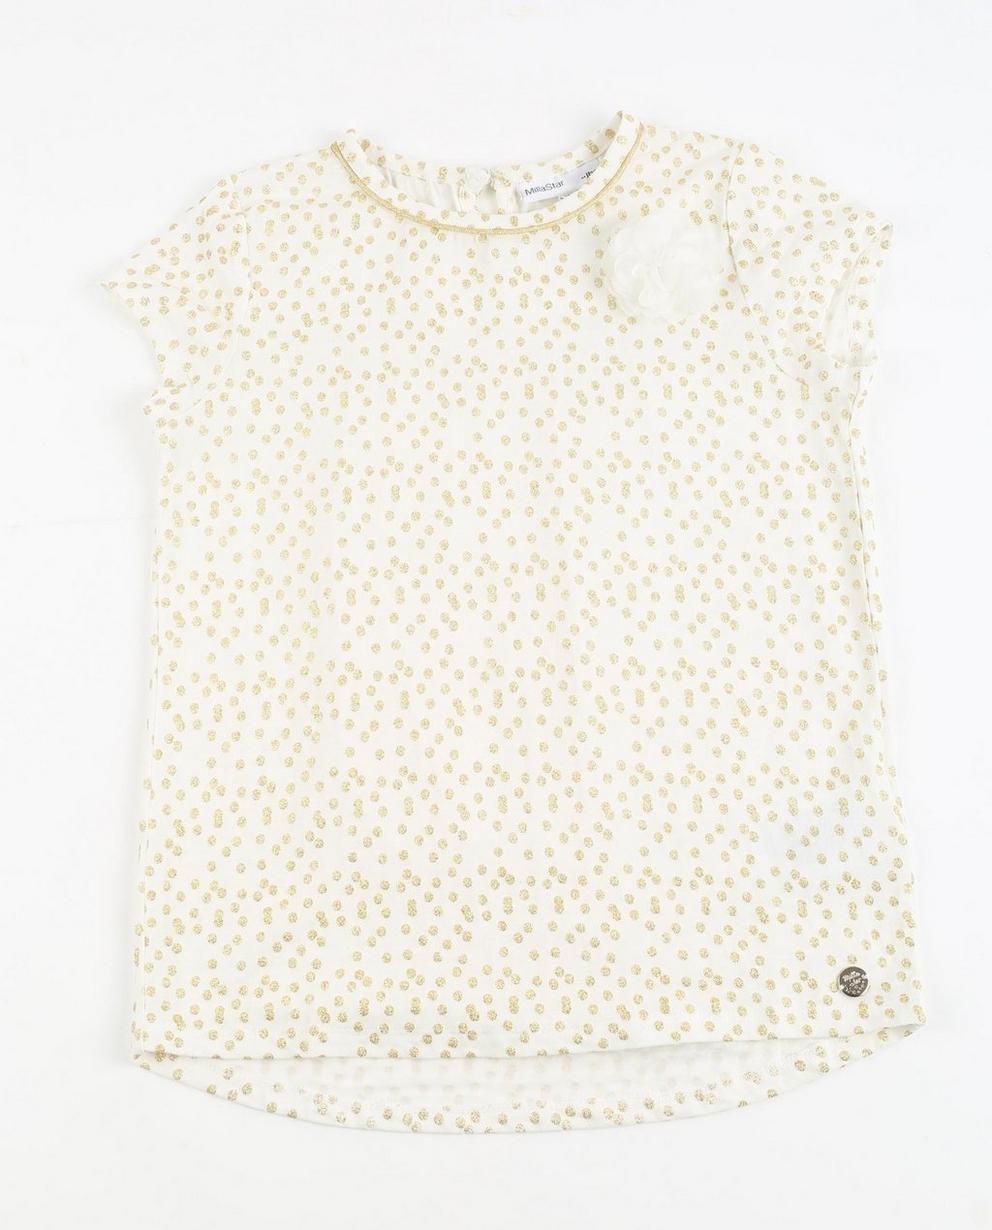 Zartes T-Shirt - mit goldfarbenem Pünktchenprint - JBC